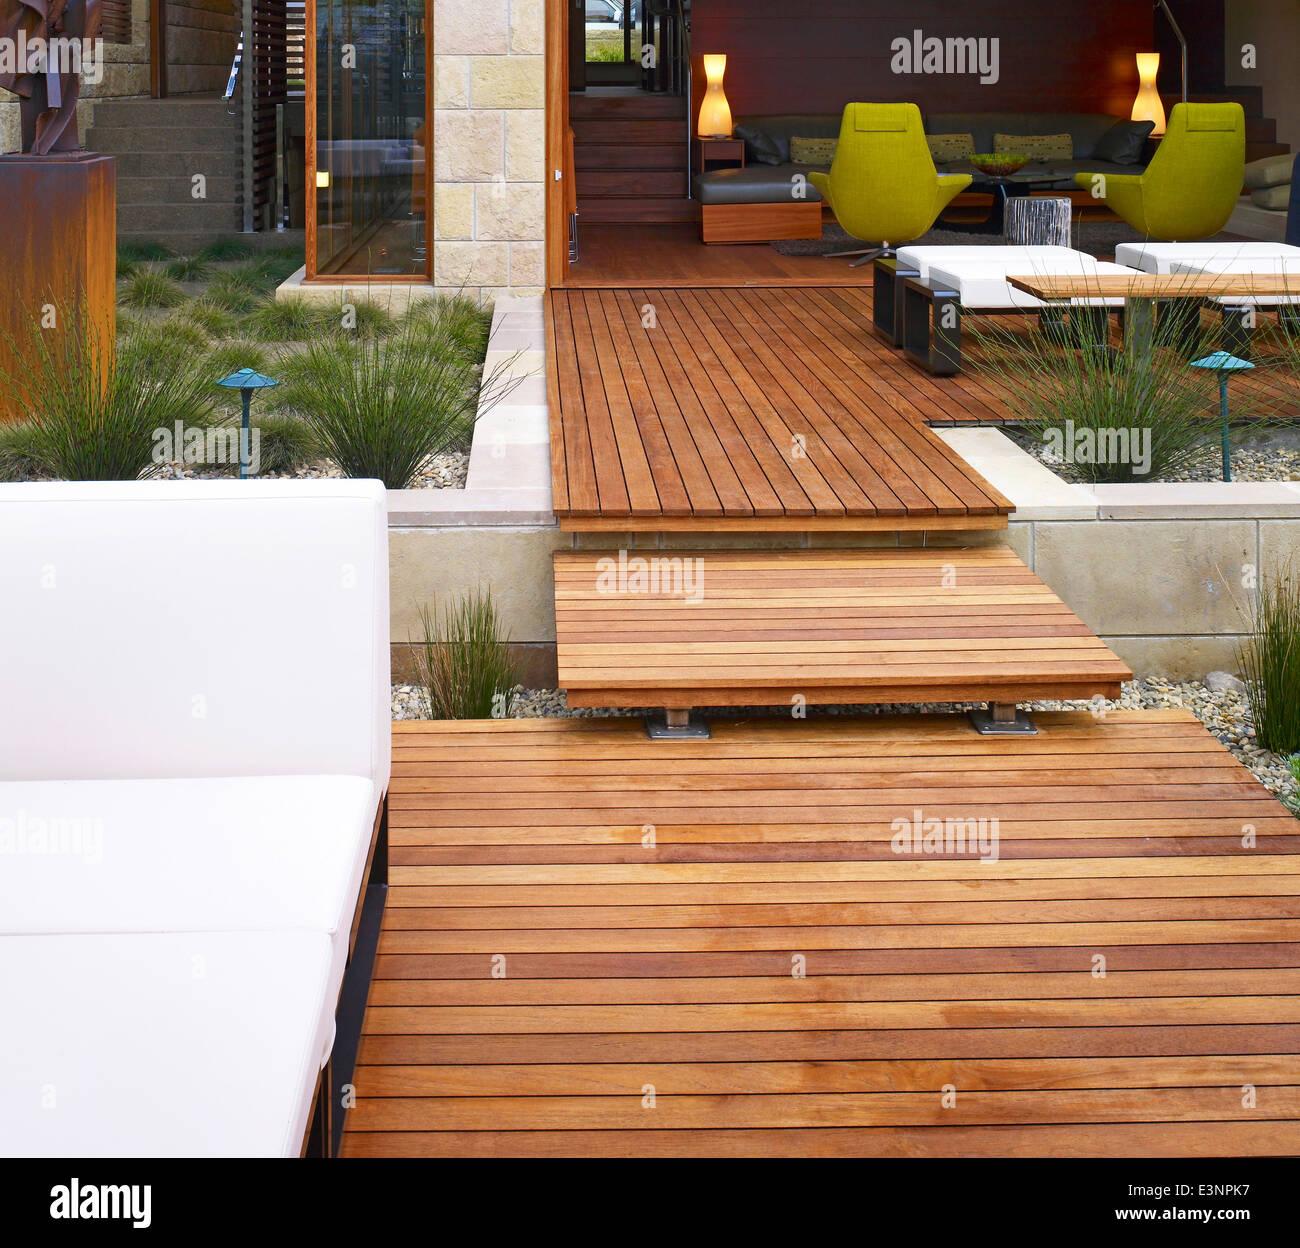 Split level terrace in garden of Odyssey House, Carmel, California, USA. - Stock Image